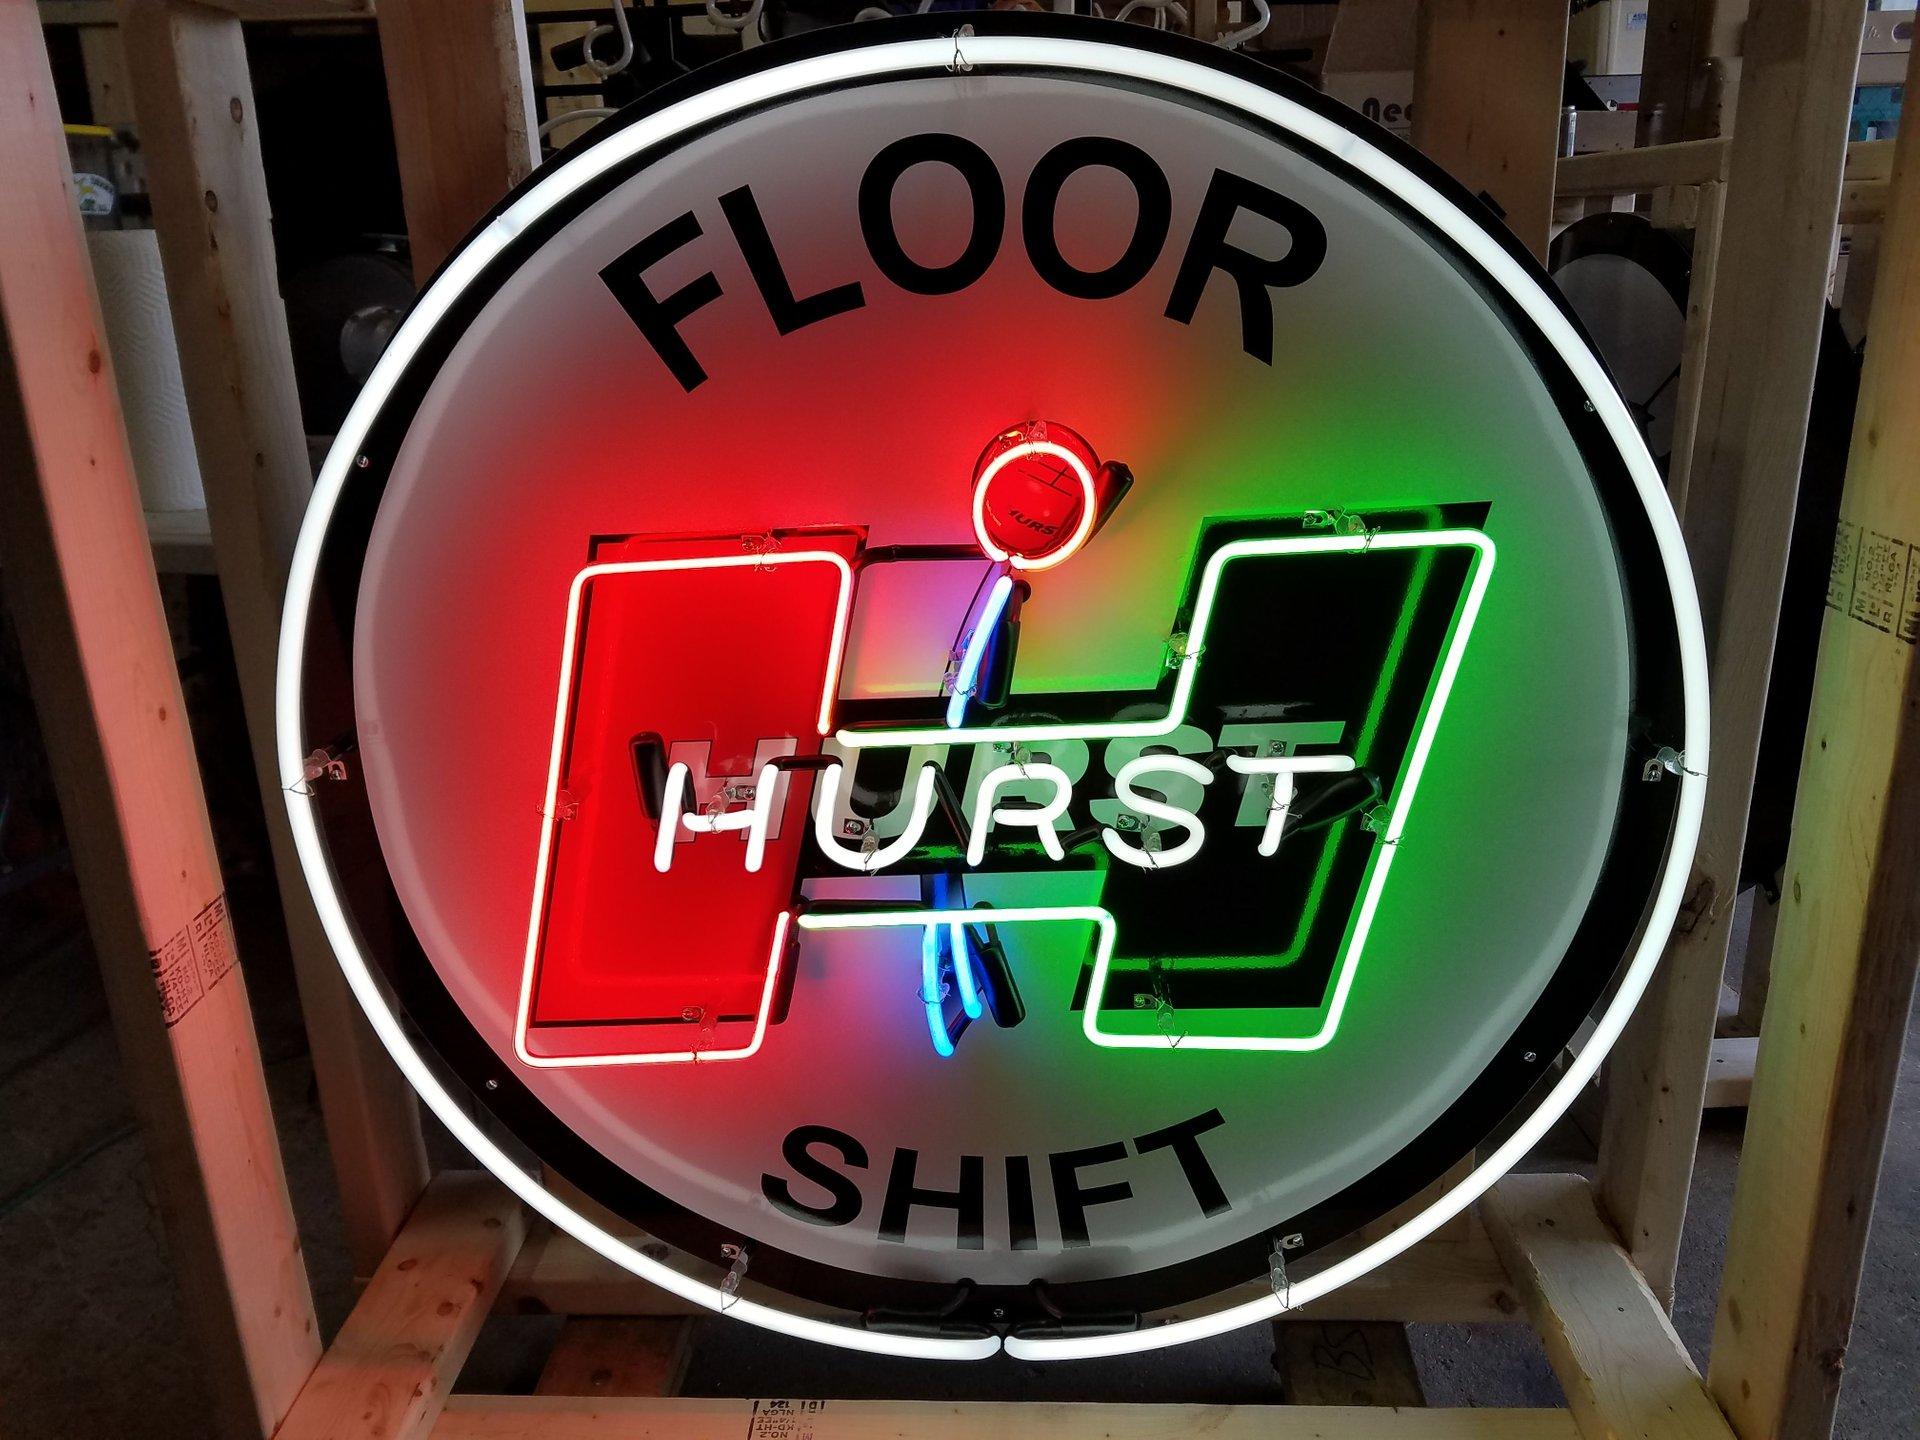 Hurst floor shift tin neon sign